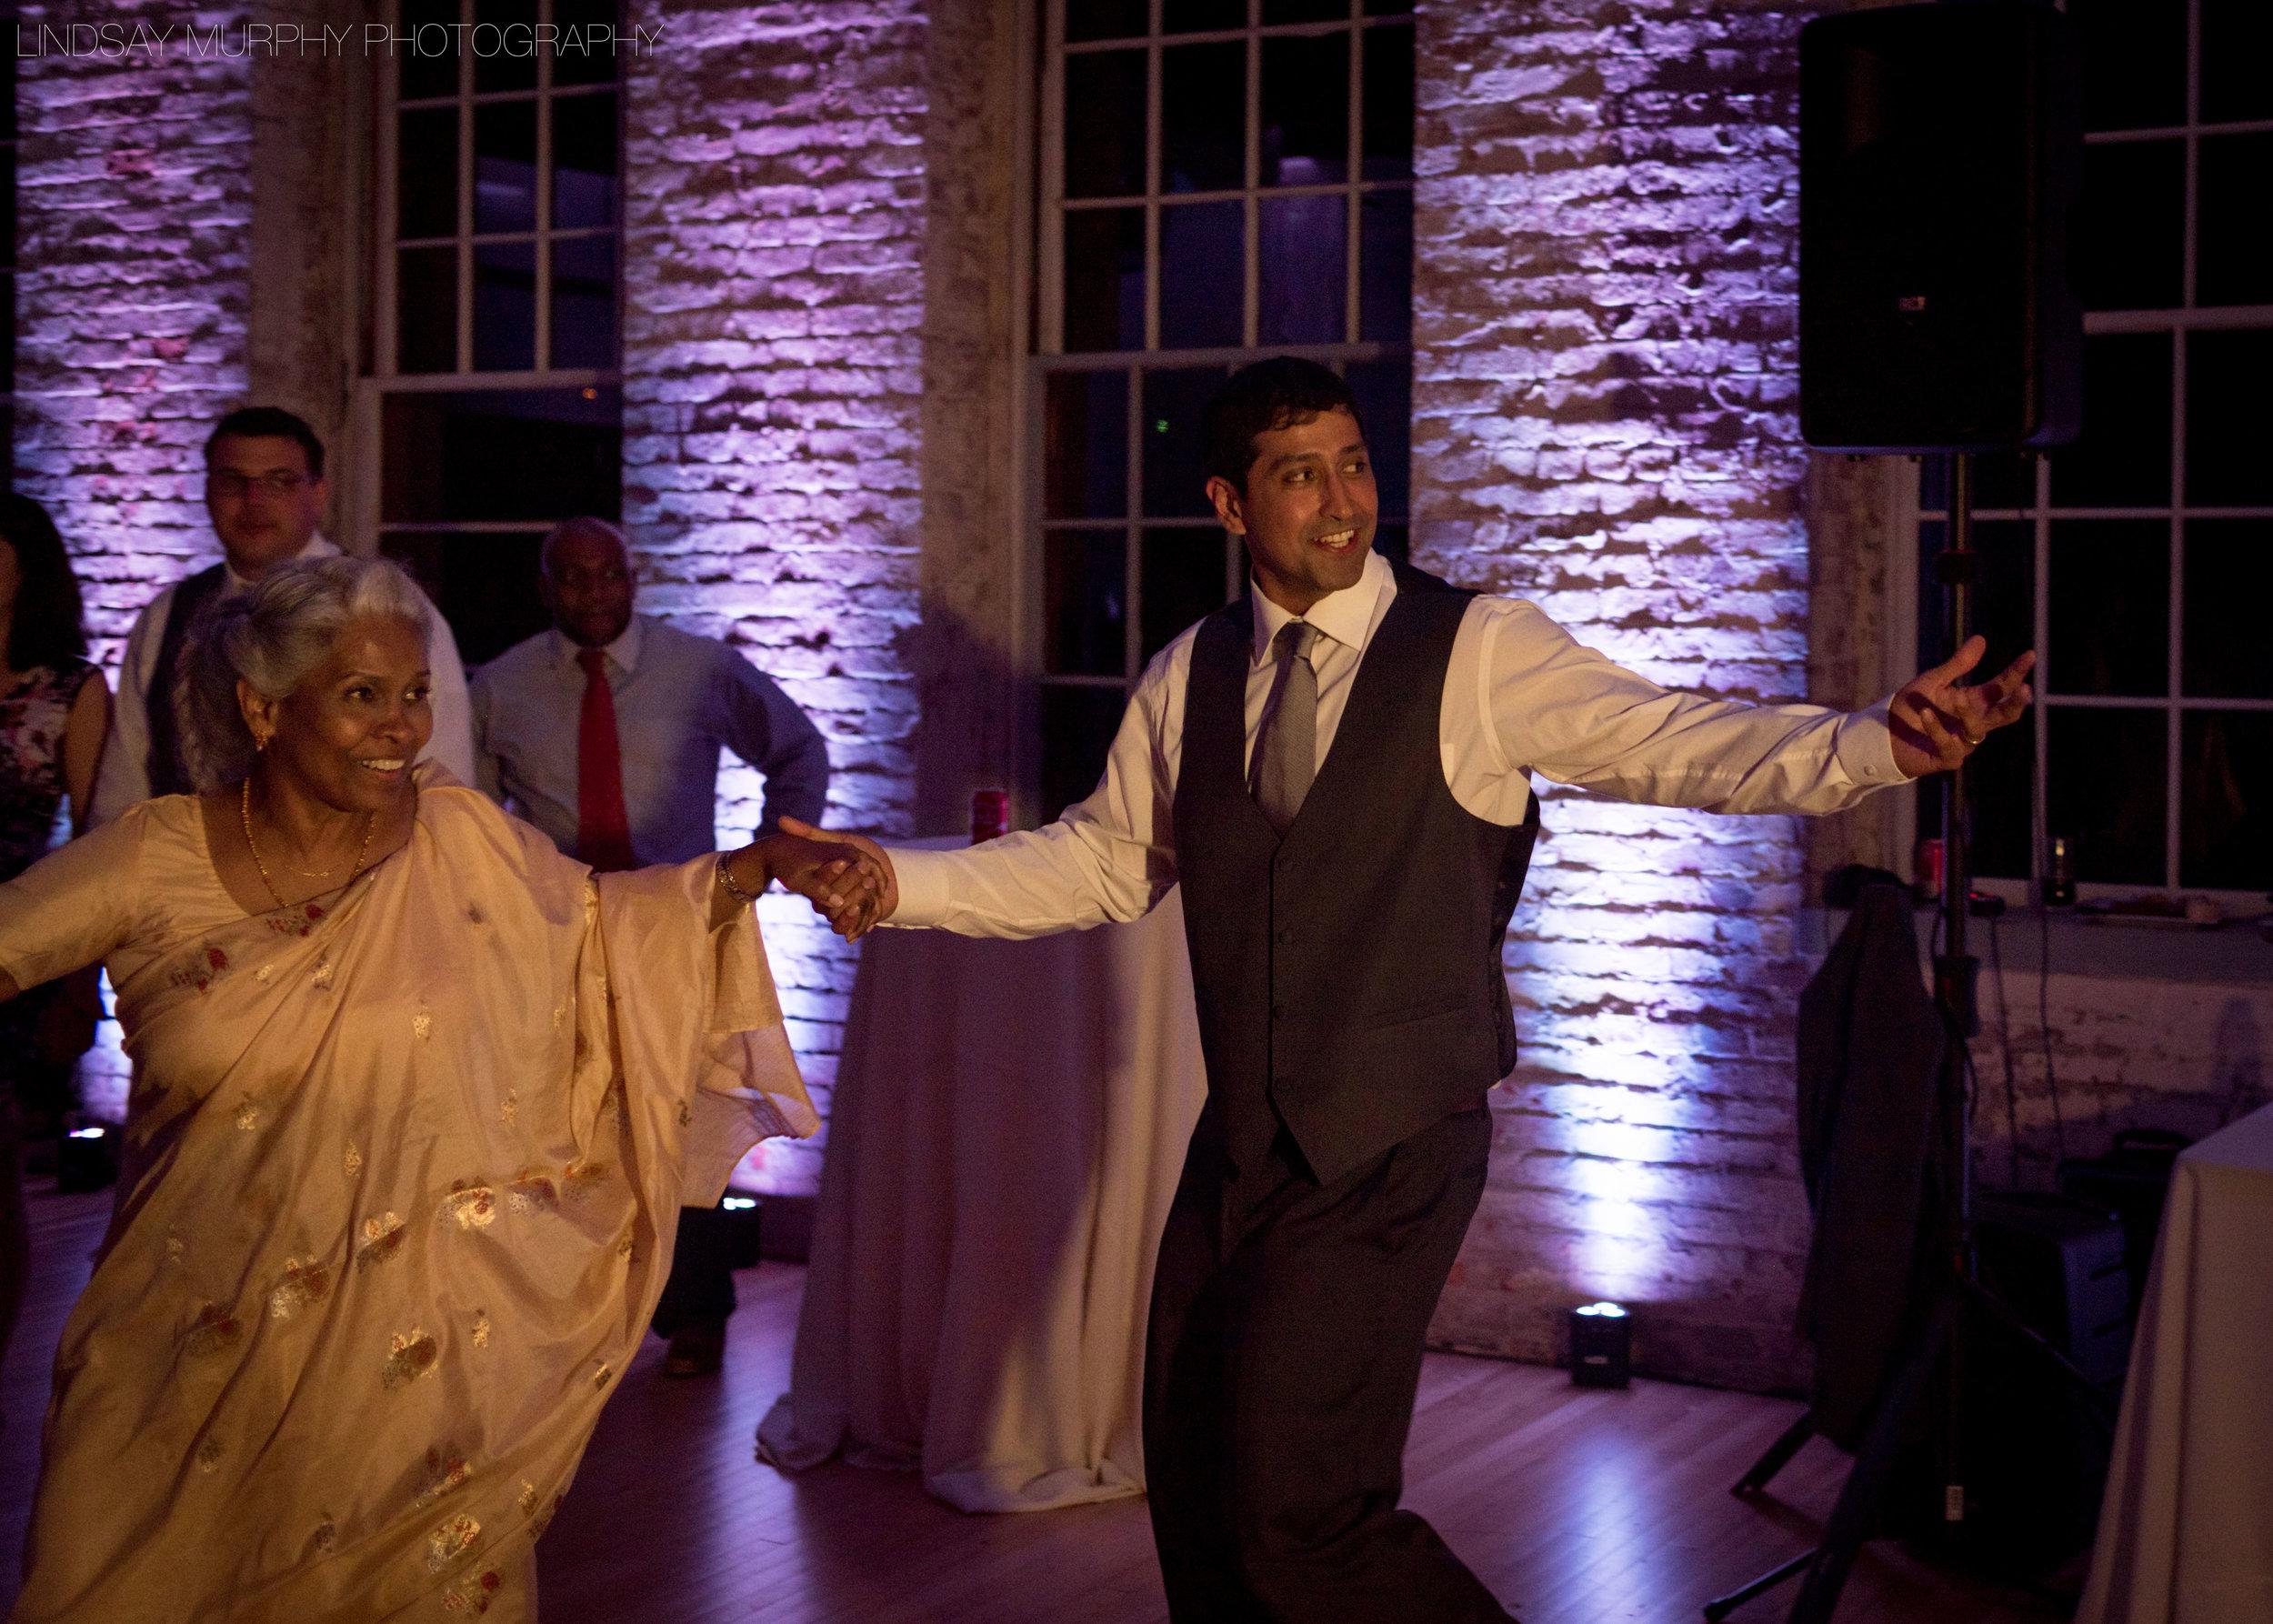 New_England_wedding-84.jpg